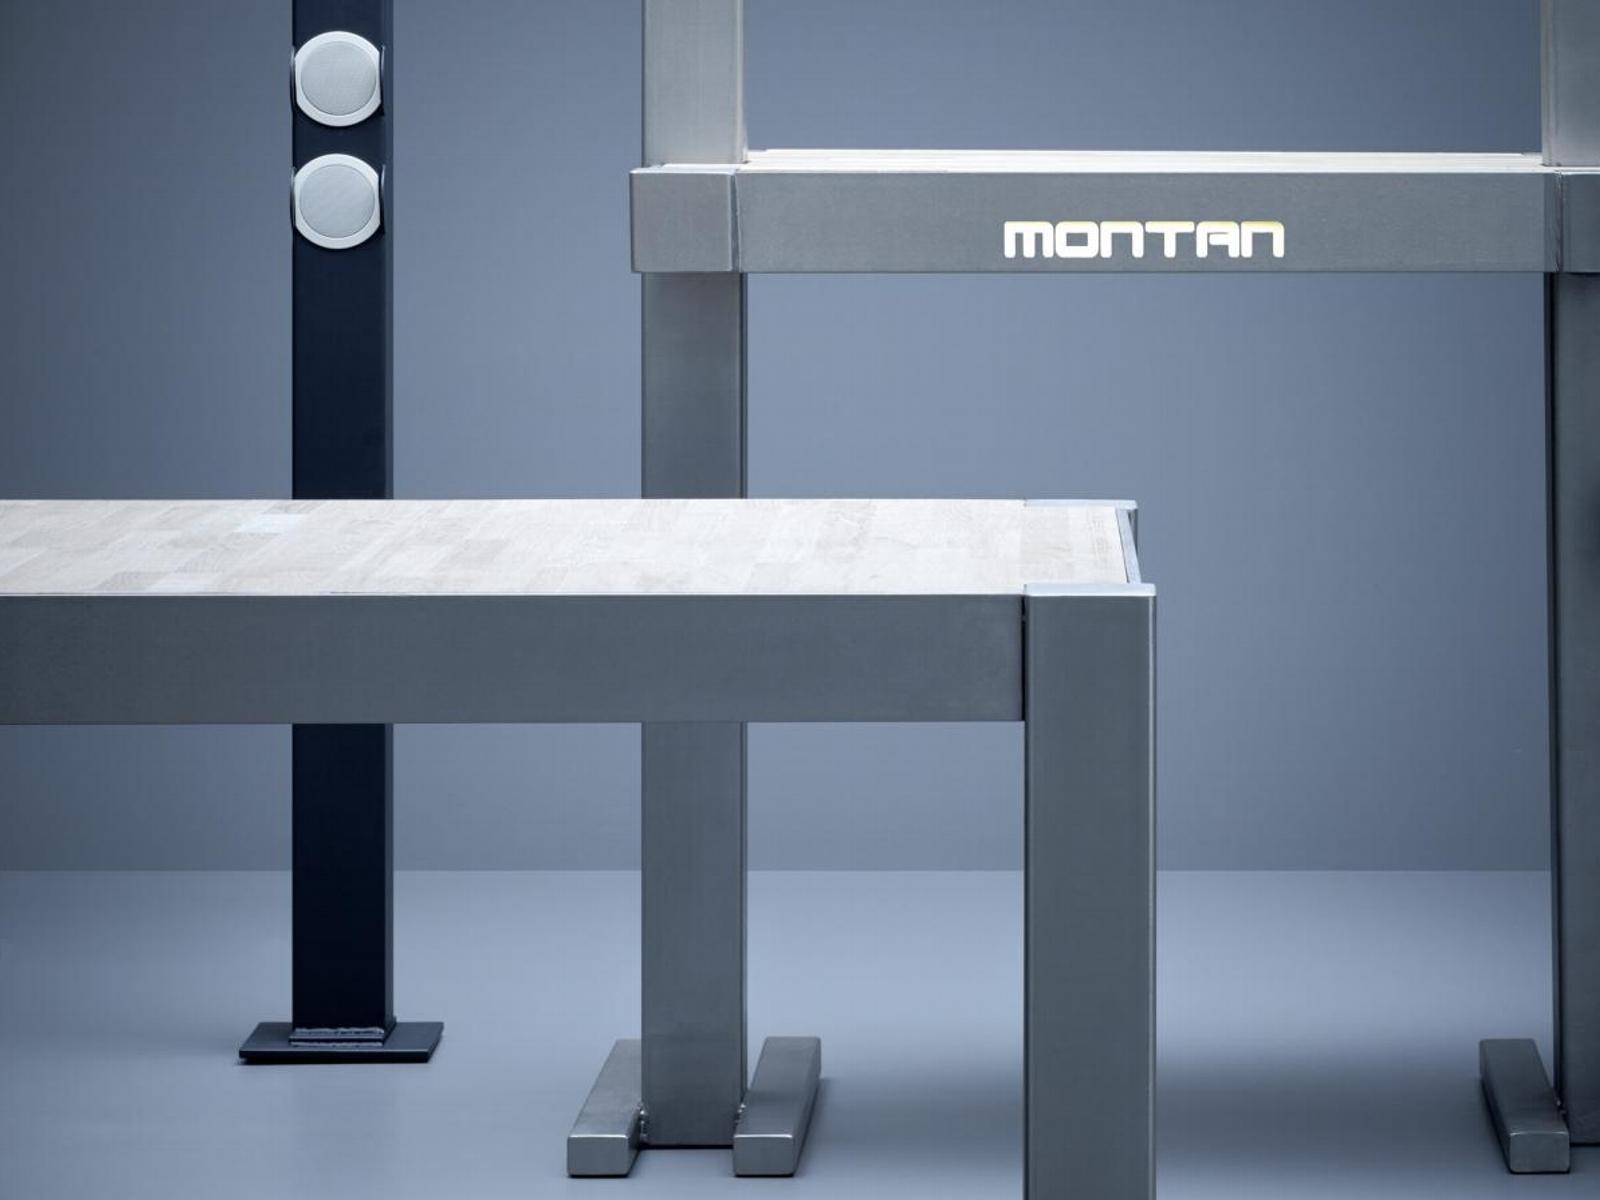 Montan-1-066_final quer